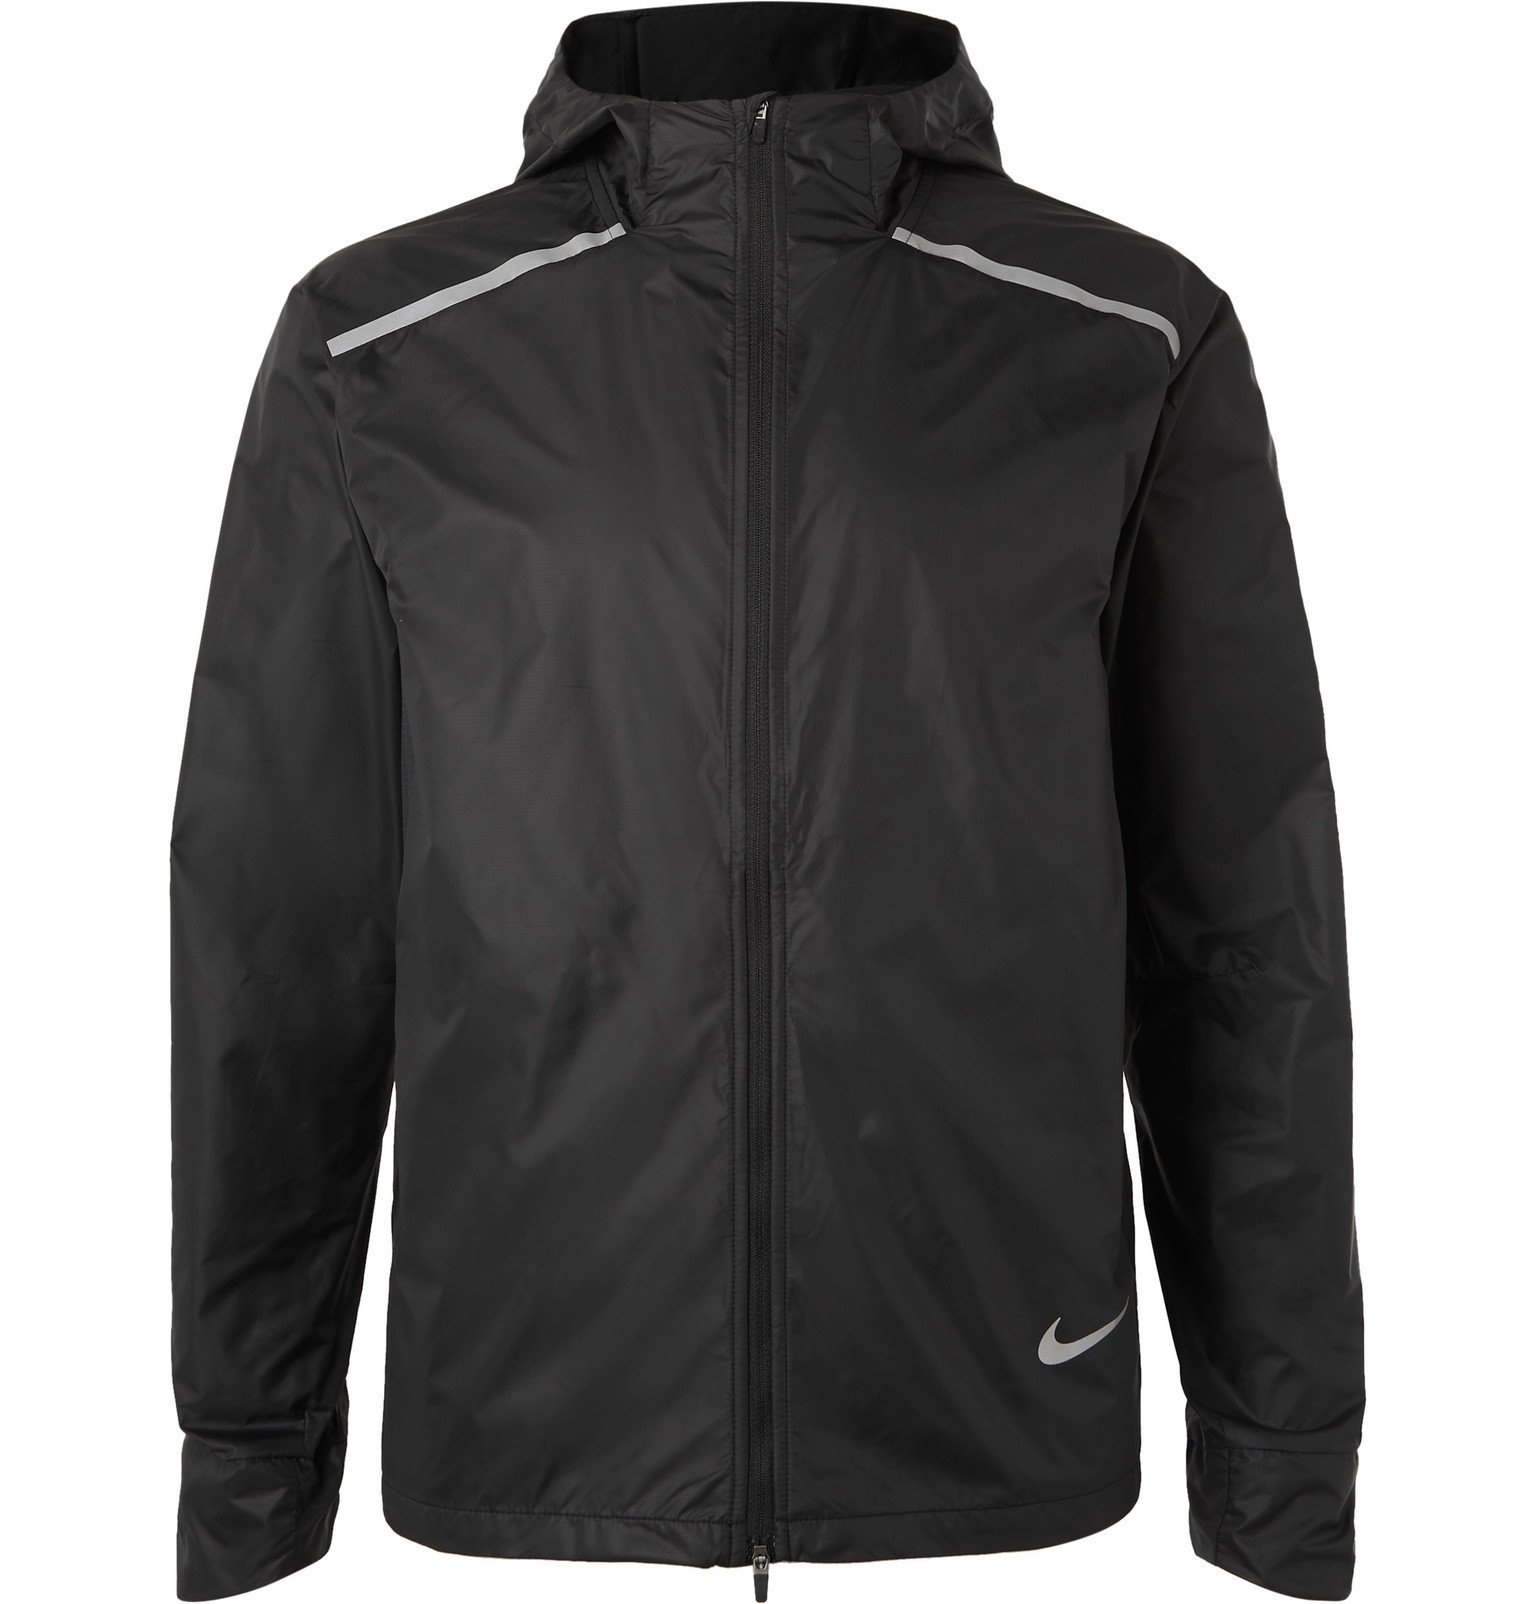 Nike Running - Ripstop Repel Hooded Jacket - Black